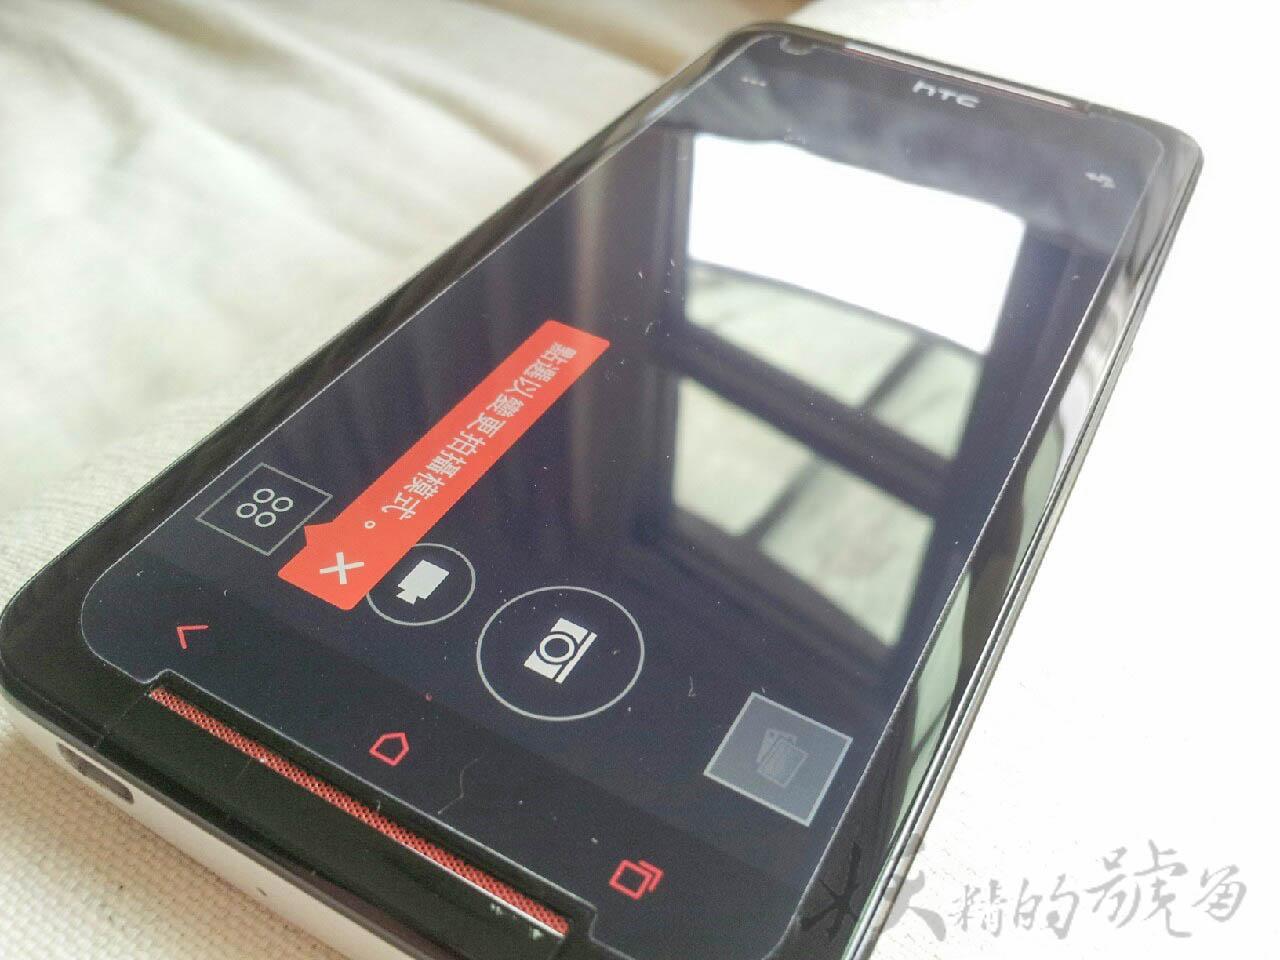 20150806 3386 - HTC Butterfly S 相機紫光 - 過保維修記(已s-off + Unlocked)